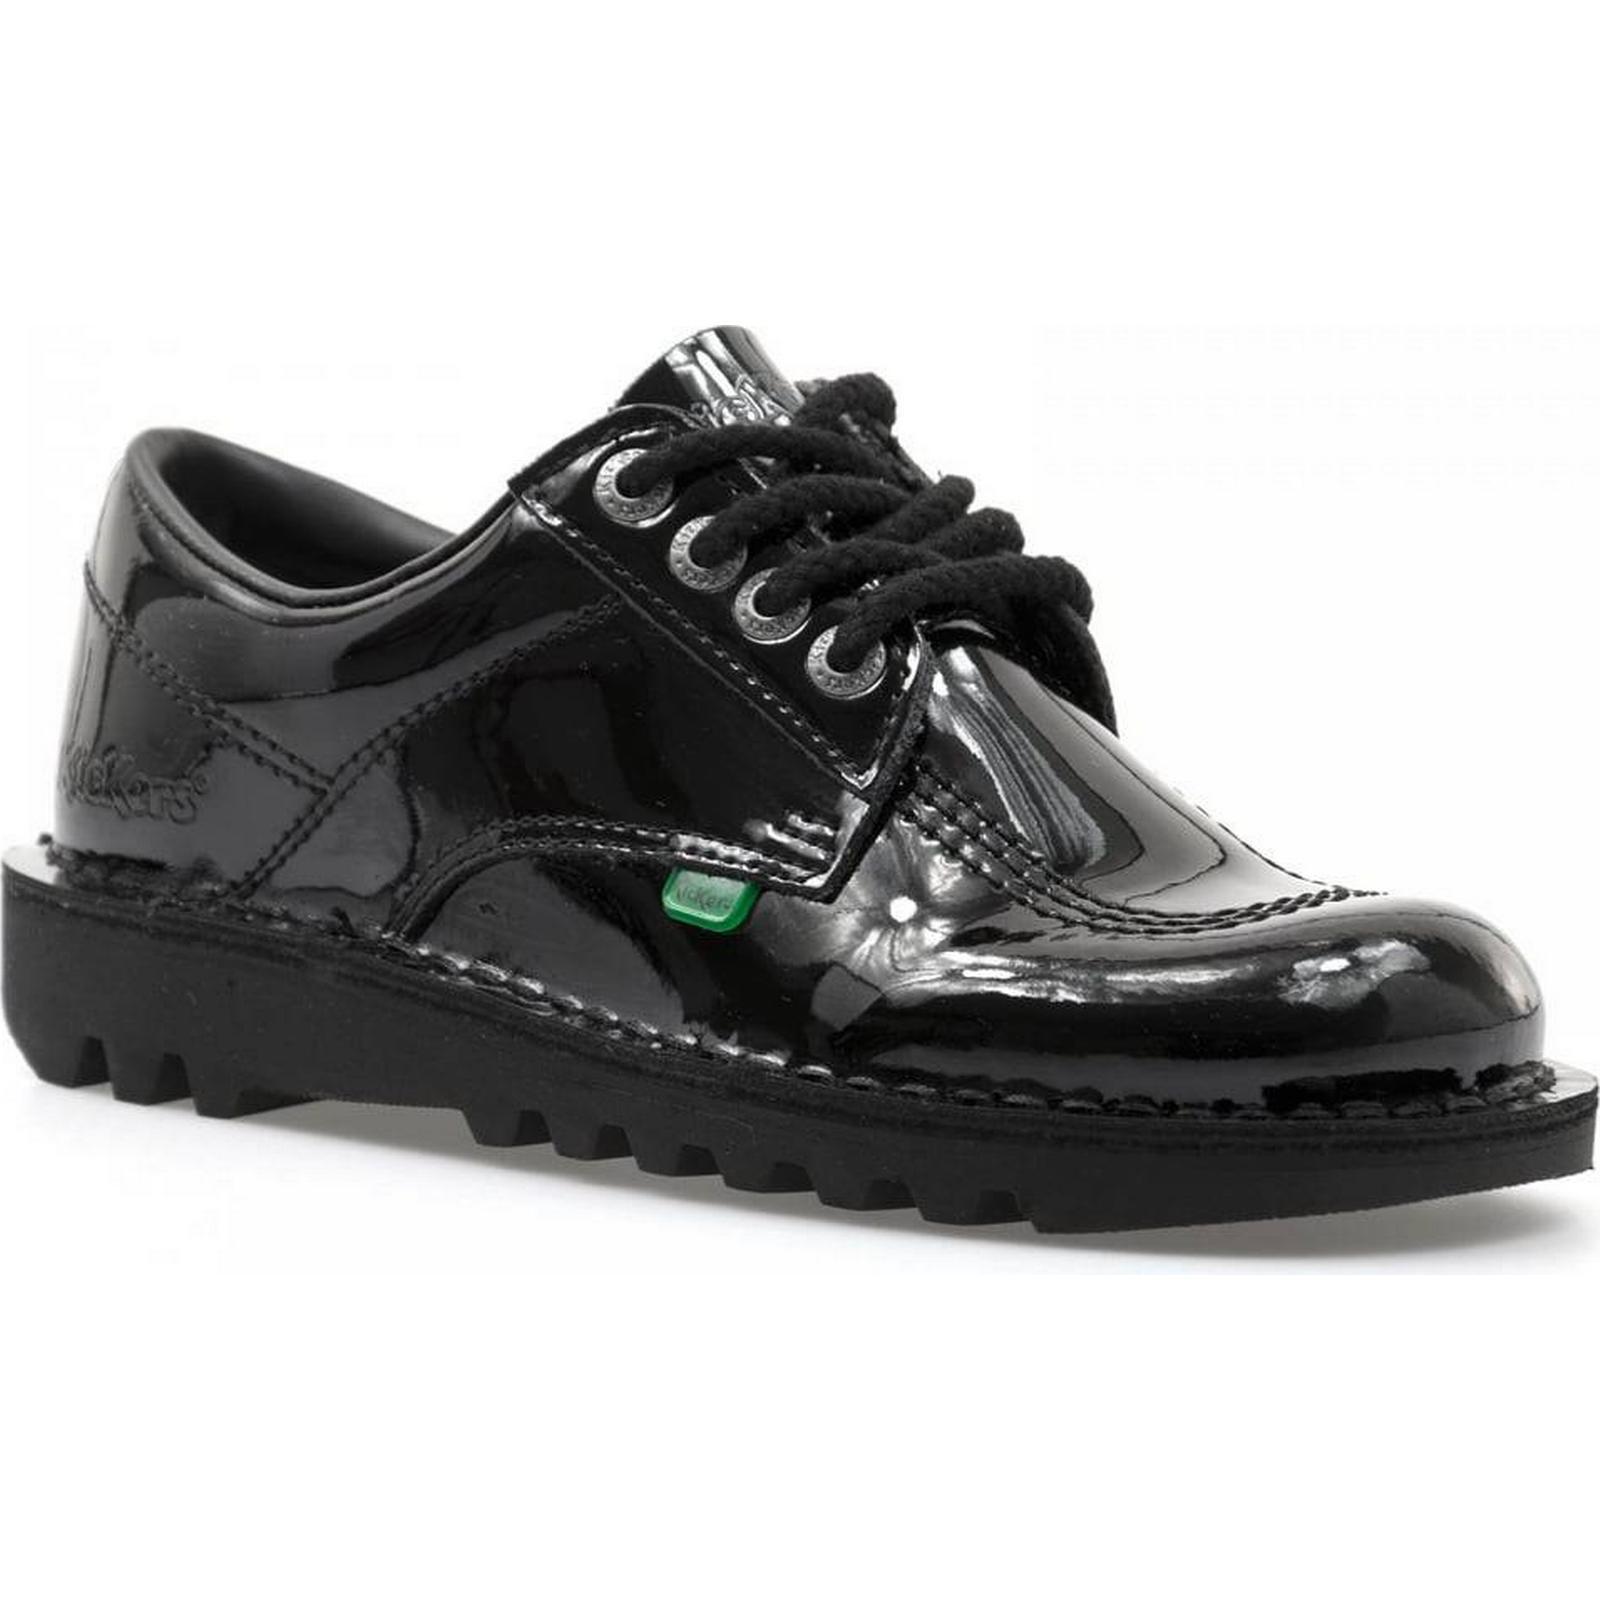 Kickers Womens Kick Low Patent Shoes BLACK (Black) Size: 5, Colour: BLACK Shoes 87988f